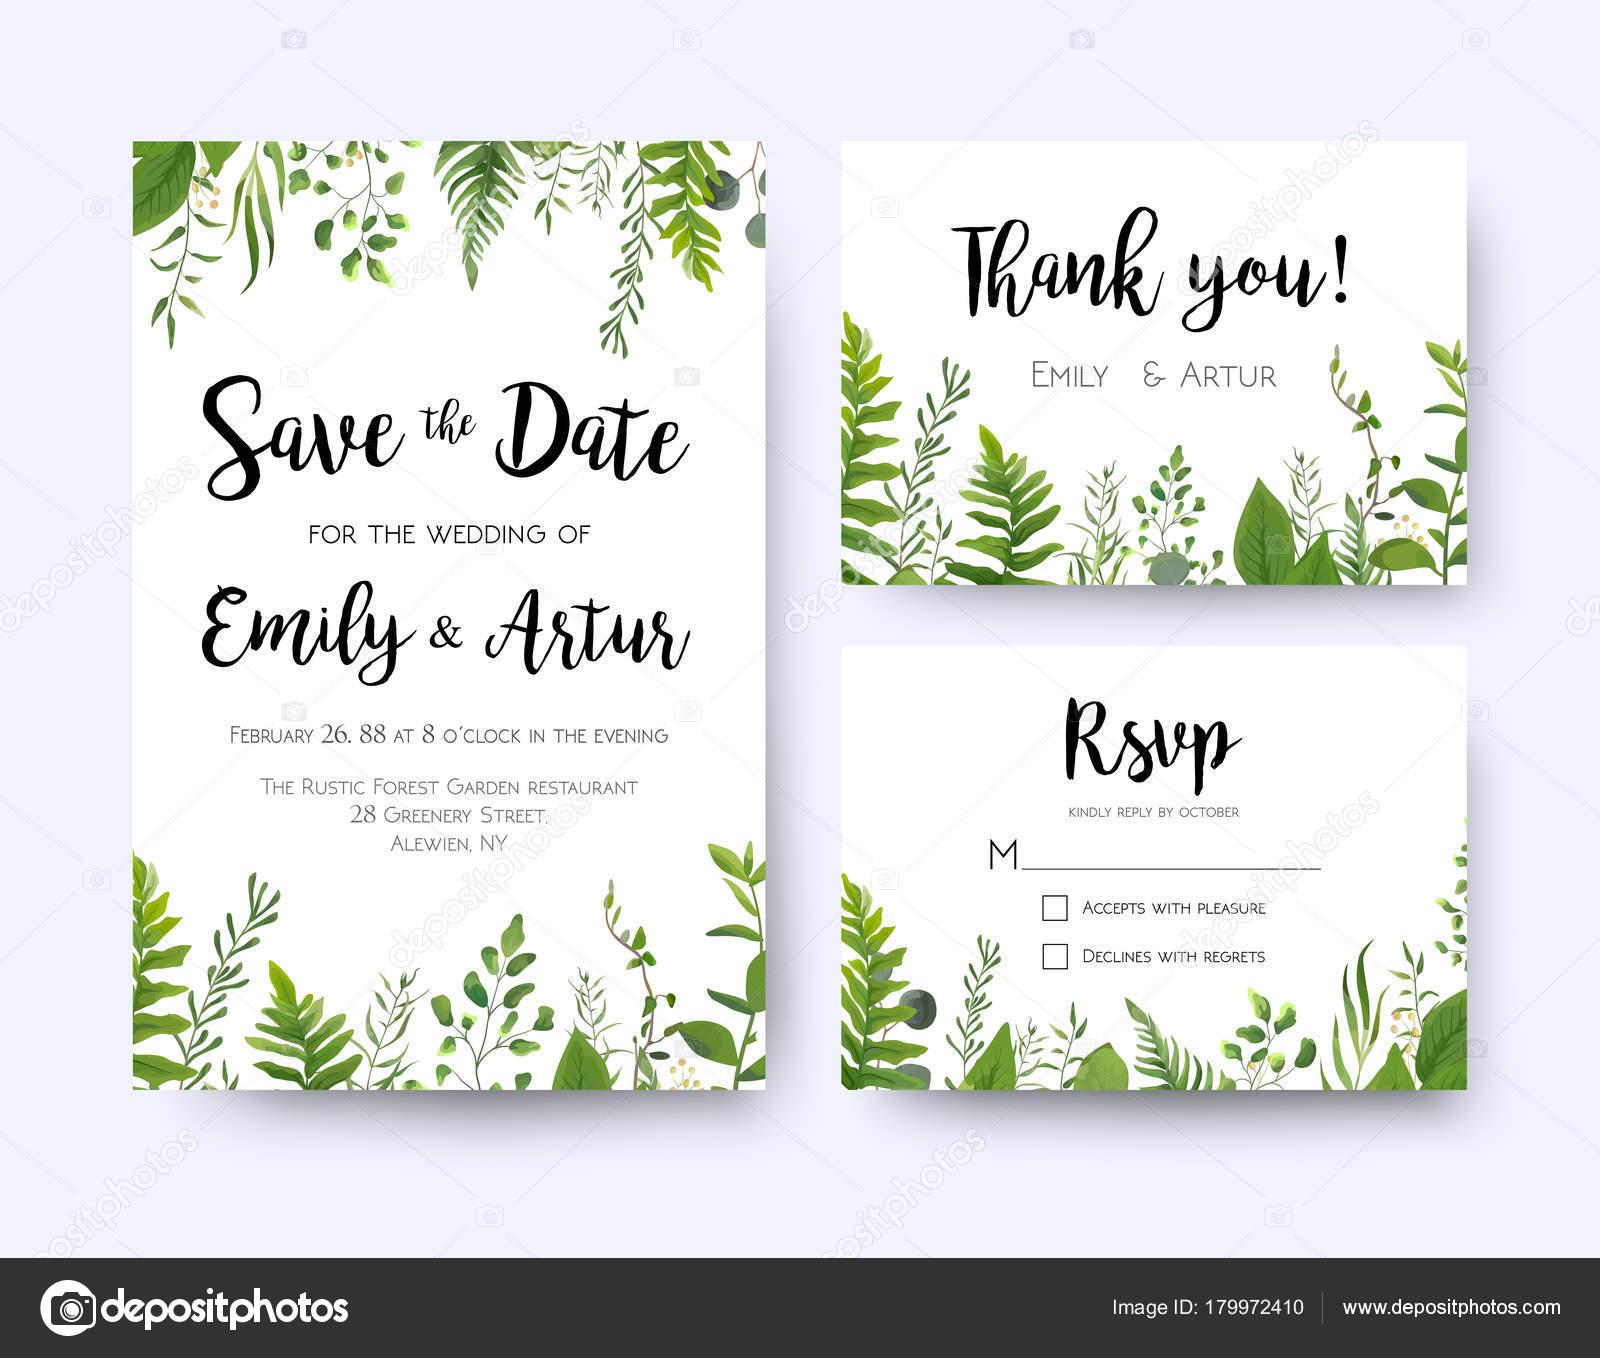 Invitation Mariage Invitation Menu Rsvp Merci Carte Vectorielle